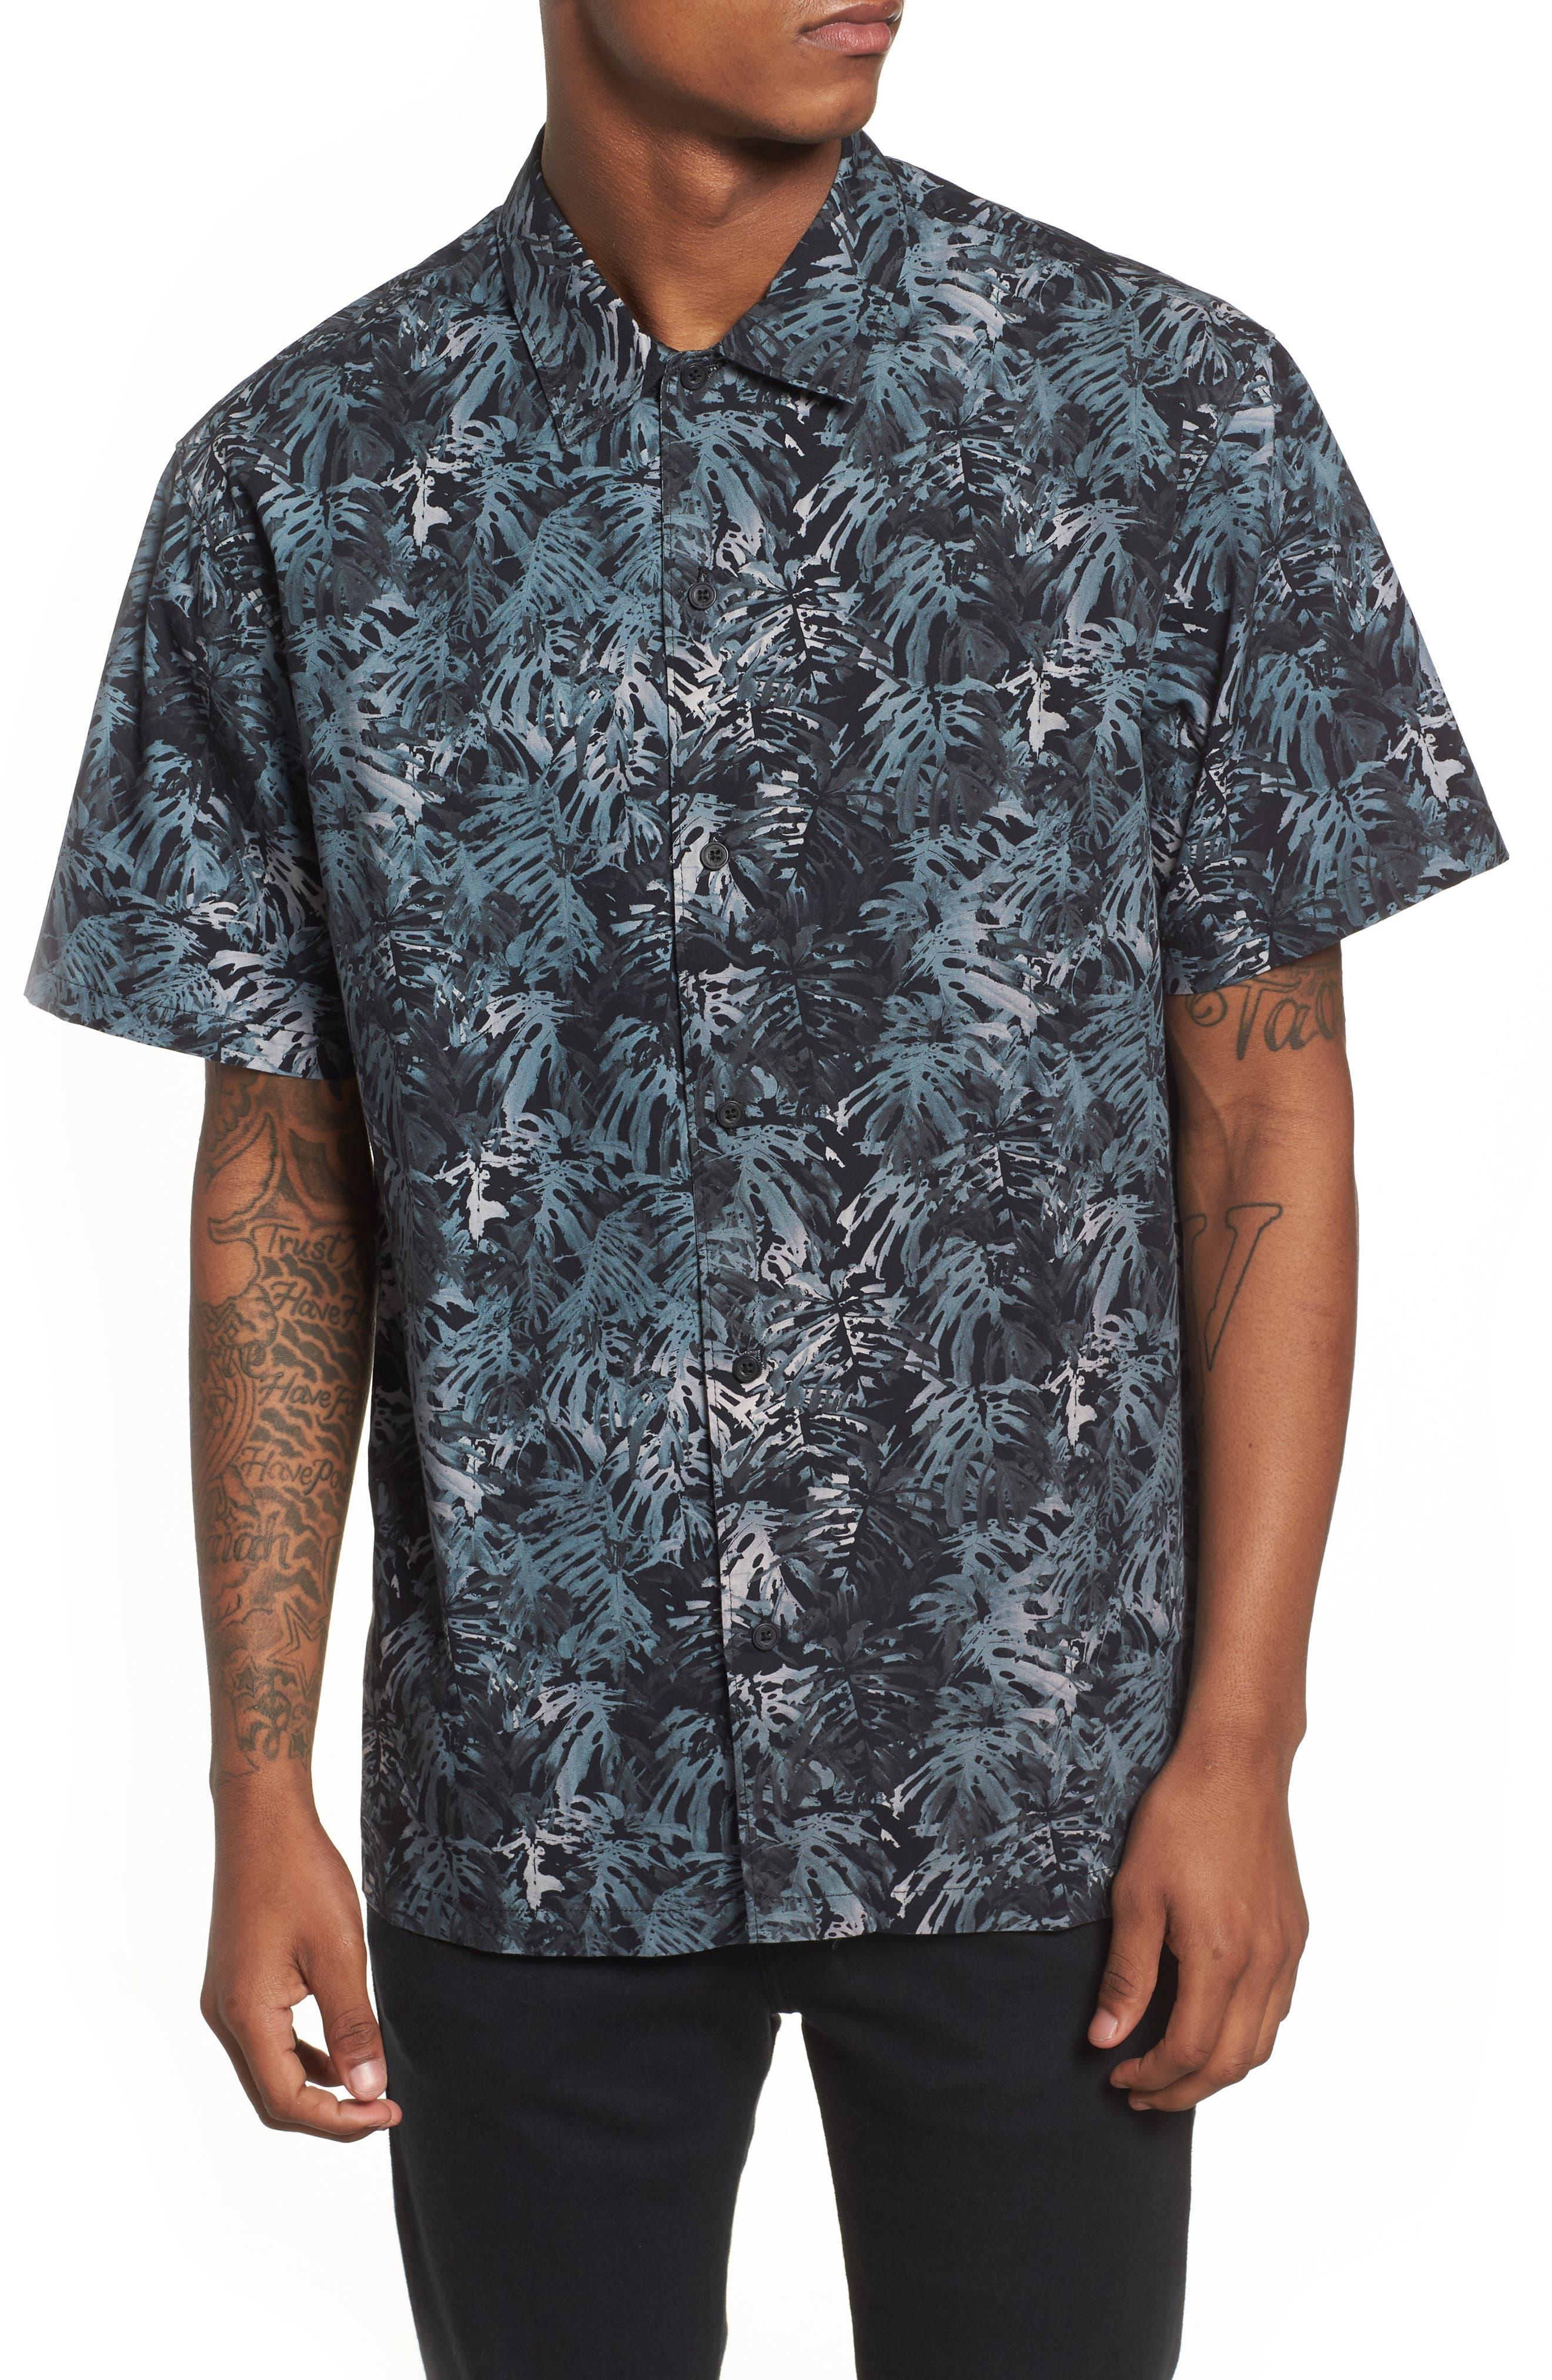 Villa Palms Short Sleeve Woven Shirt,                             Main thumbnail 1, color,                             991